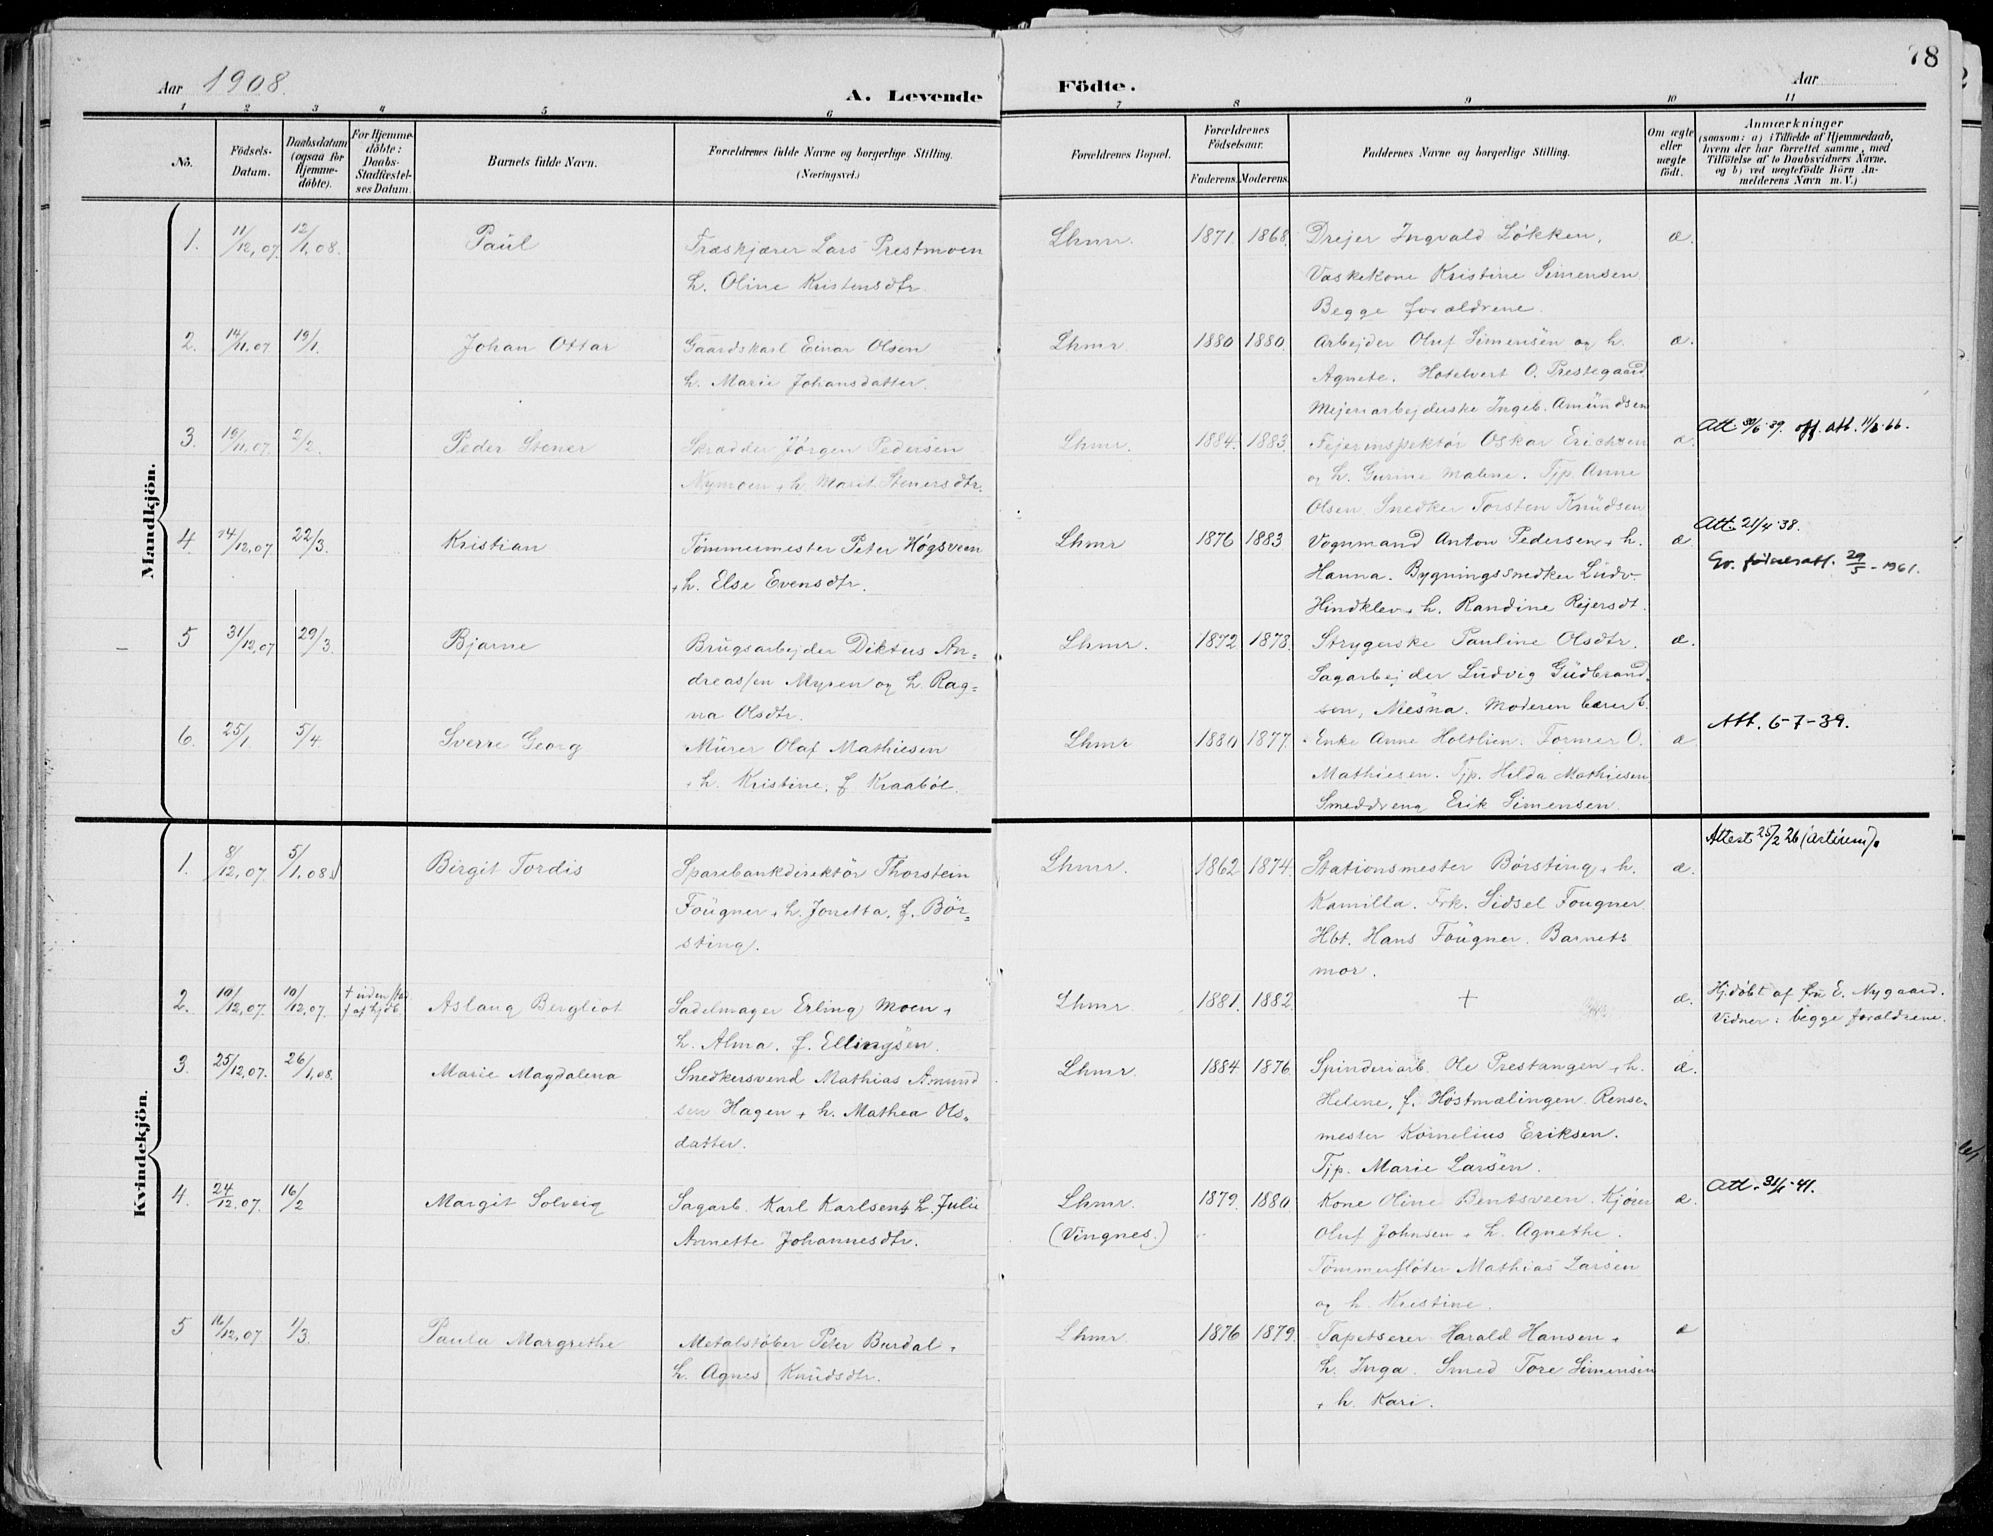 SAH, Lillehammer prestekontor, Ministerialbok nr. 1, 1901-1916, s. 78